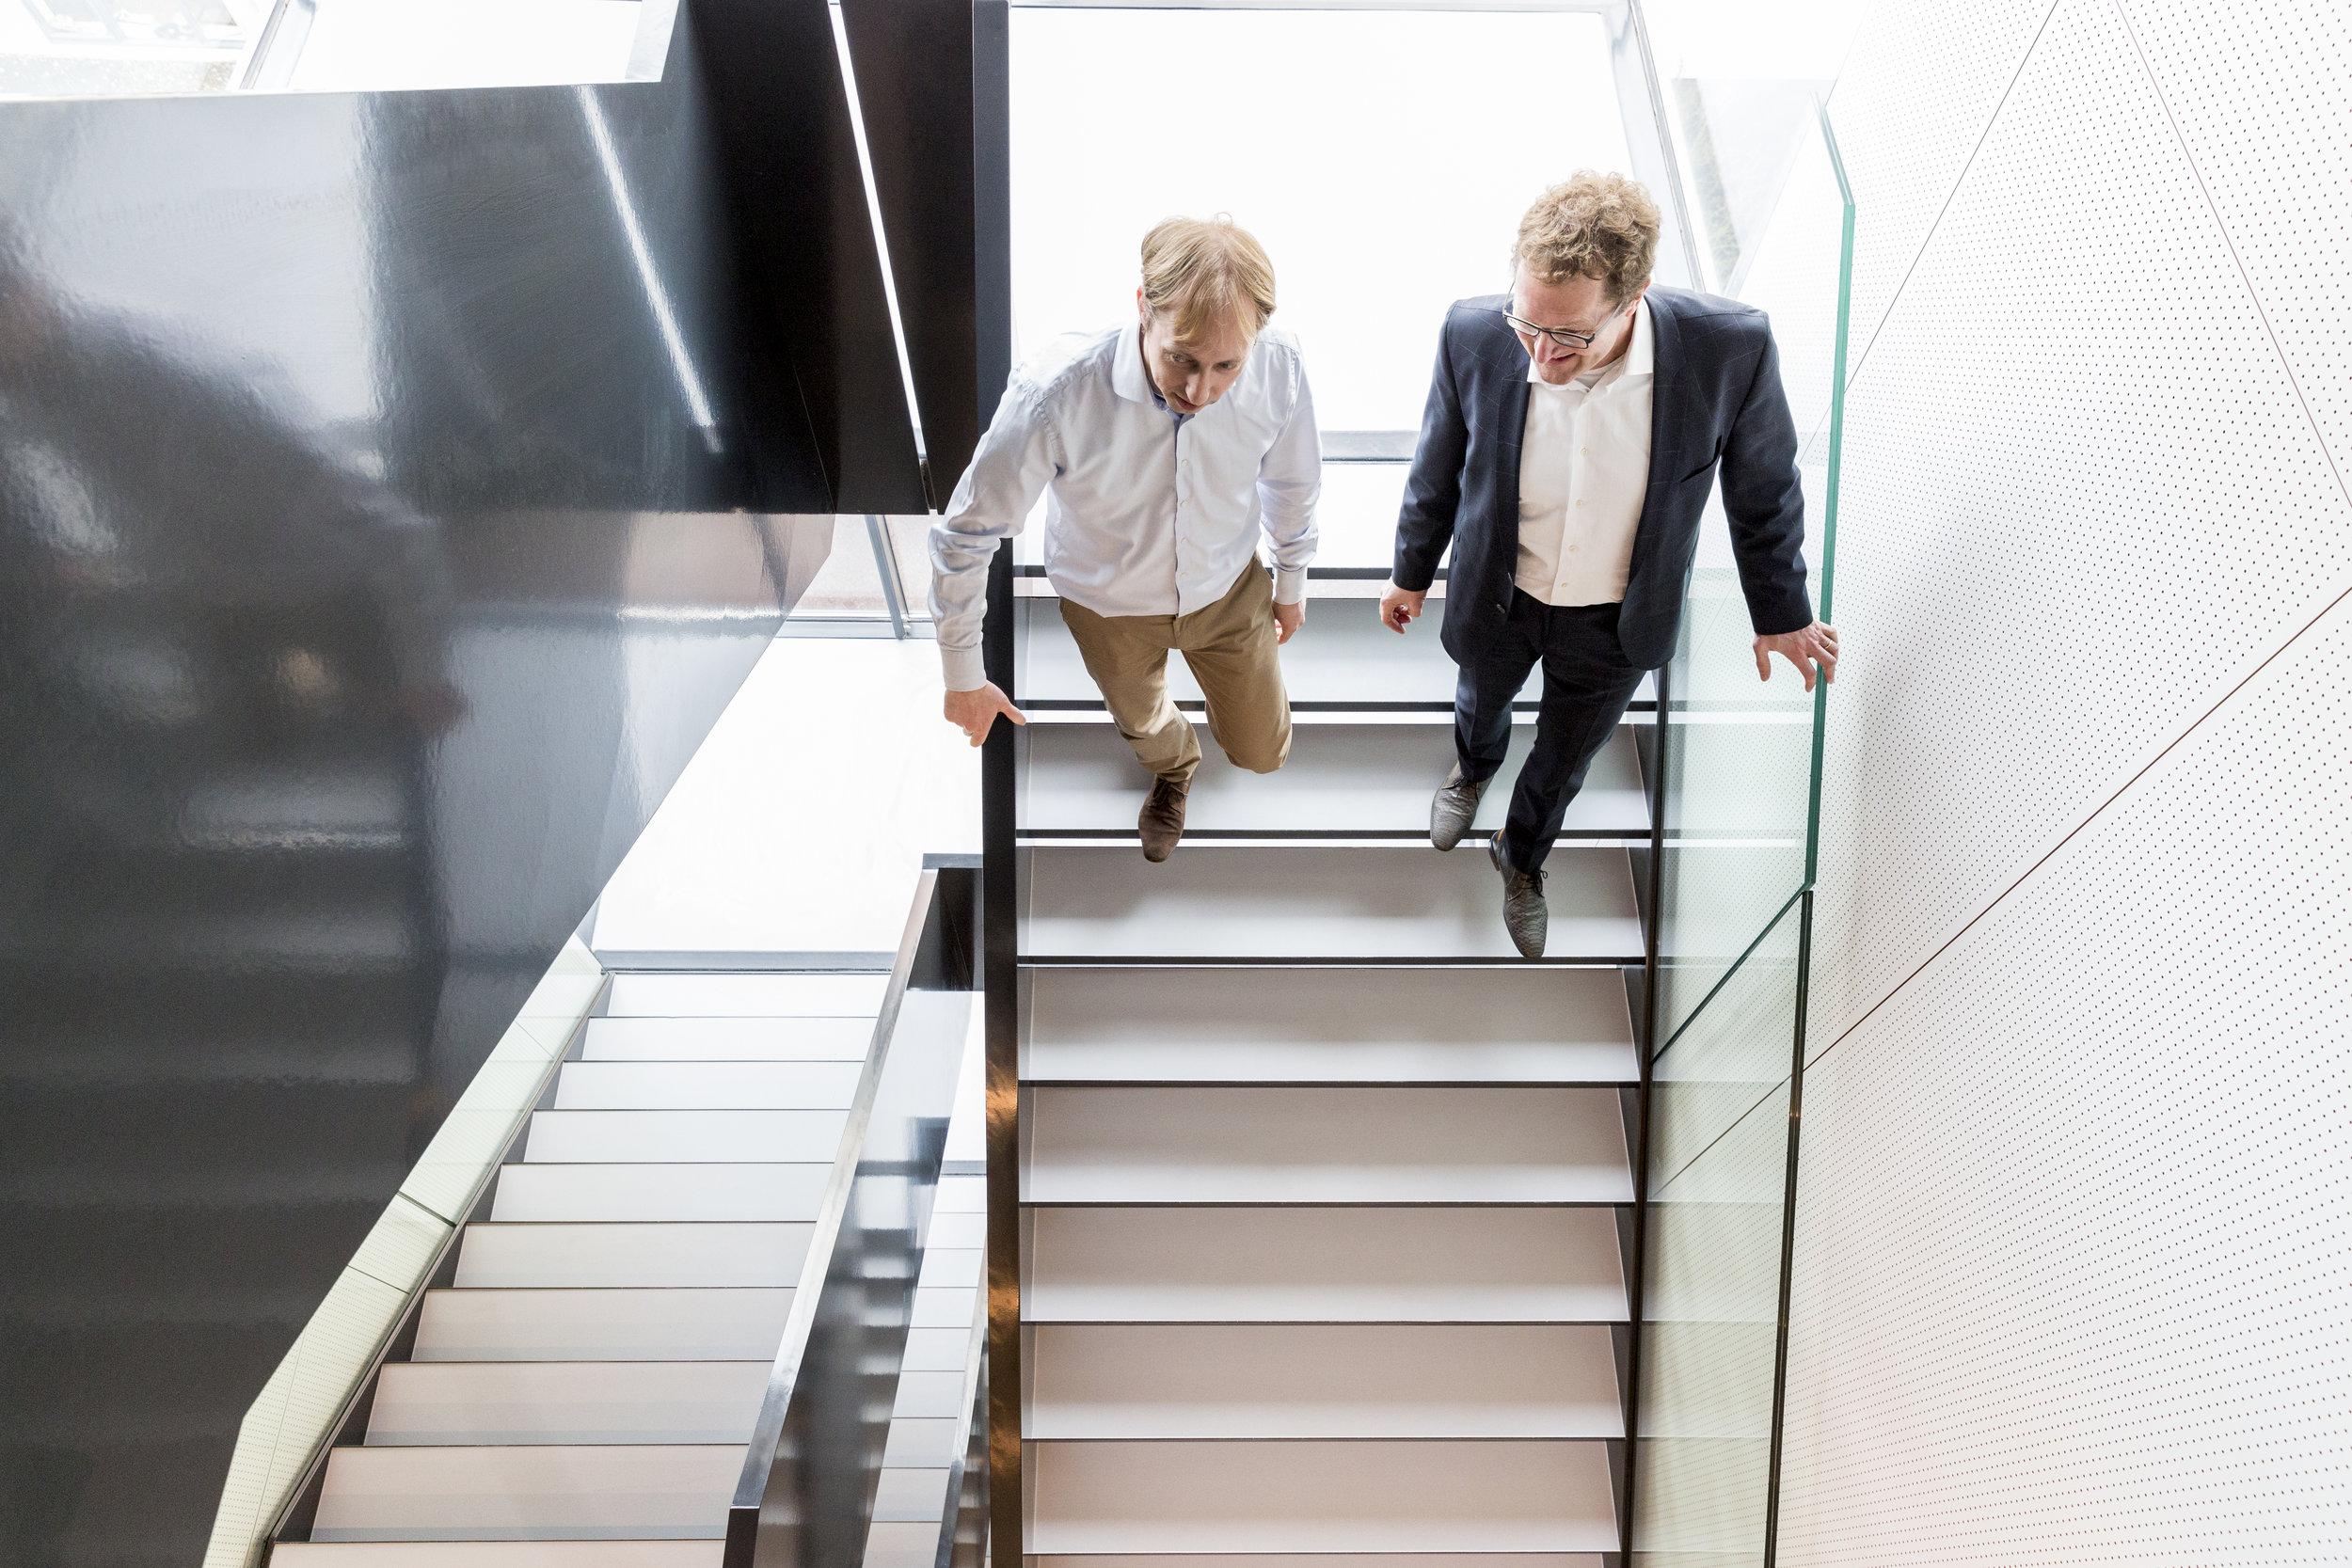 René & Jaap (for Houdbaar, client: Witteveen+Bos)